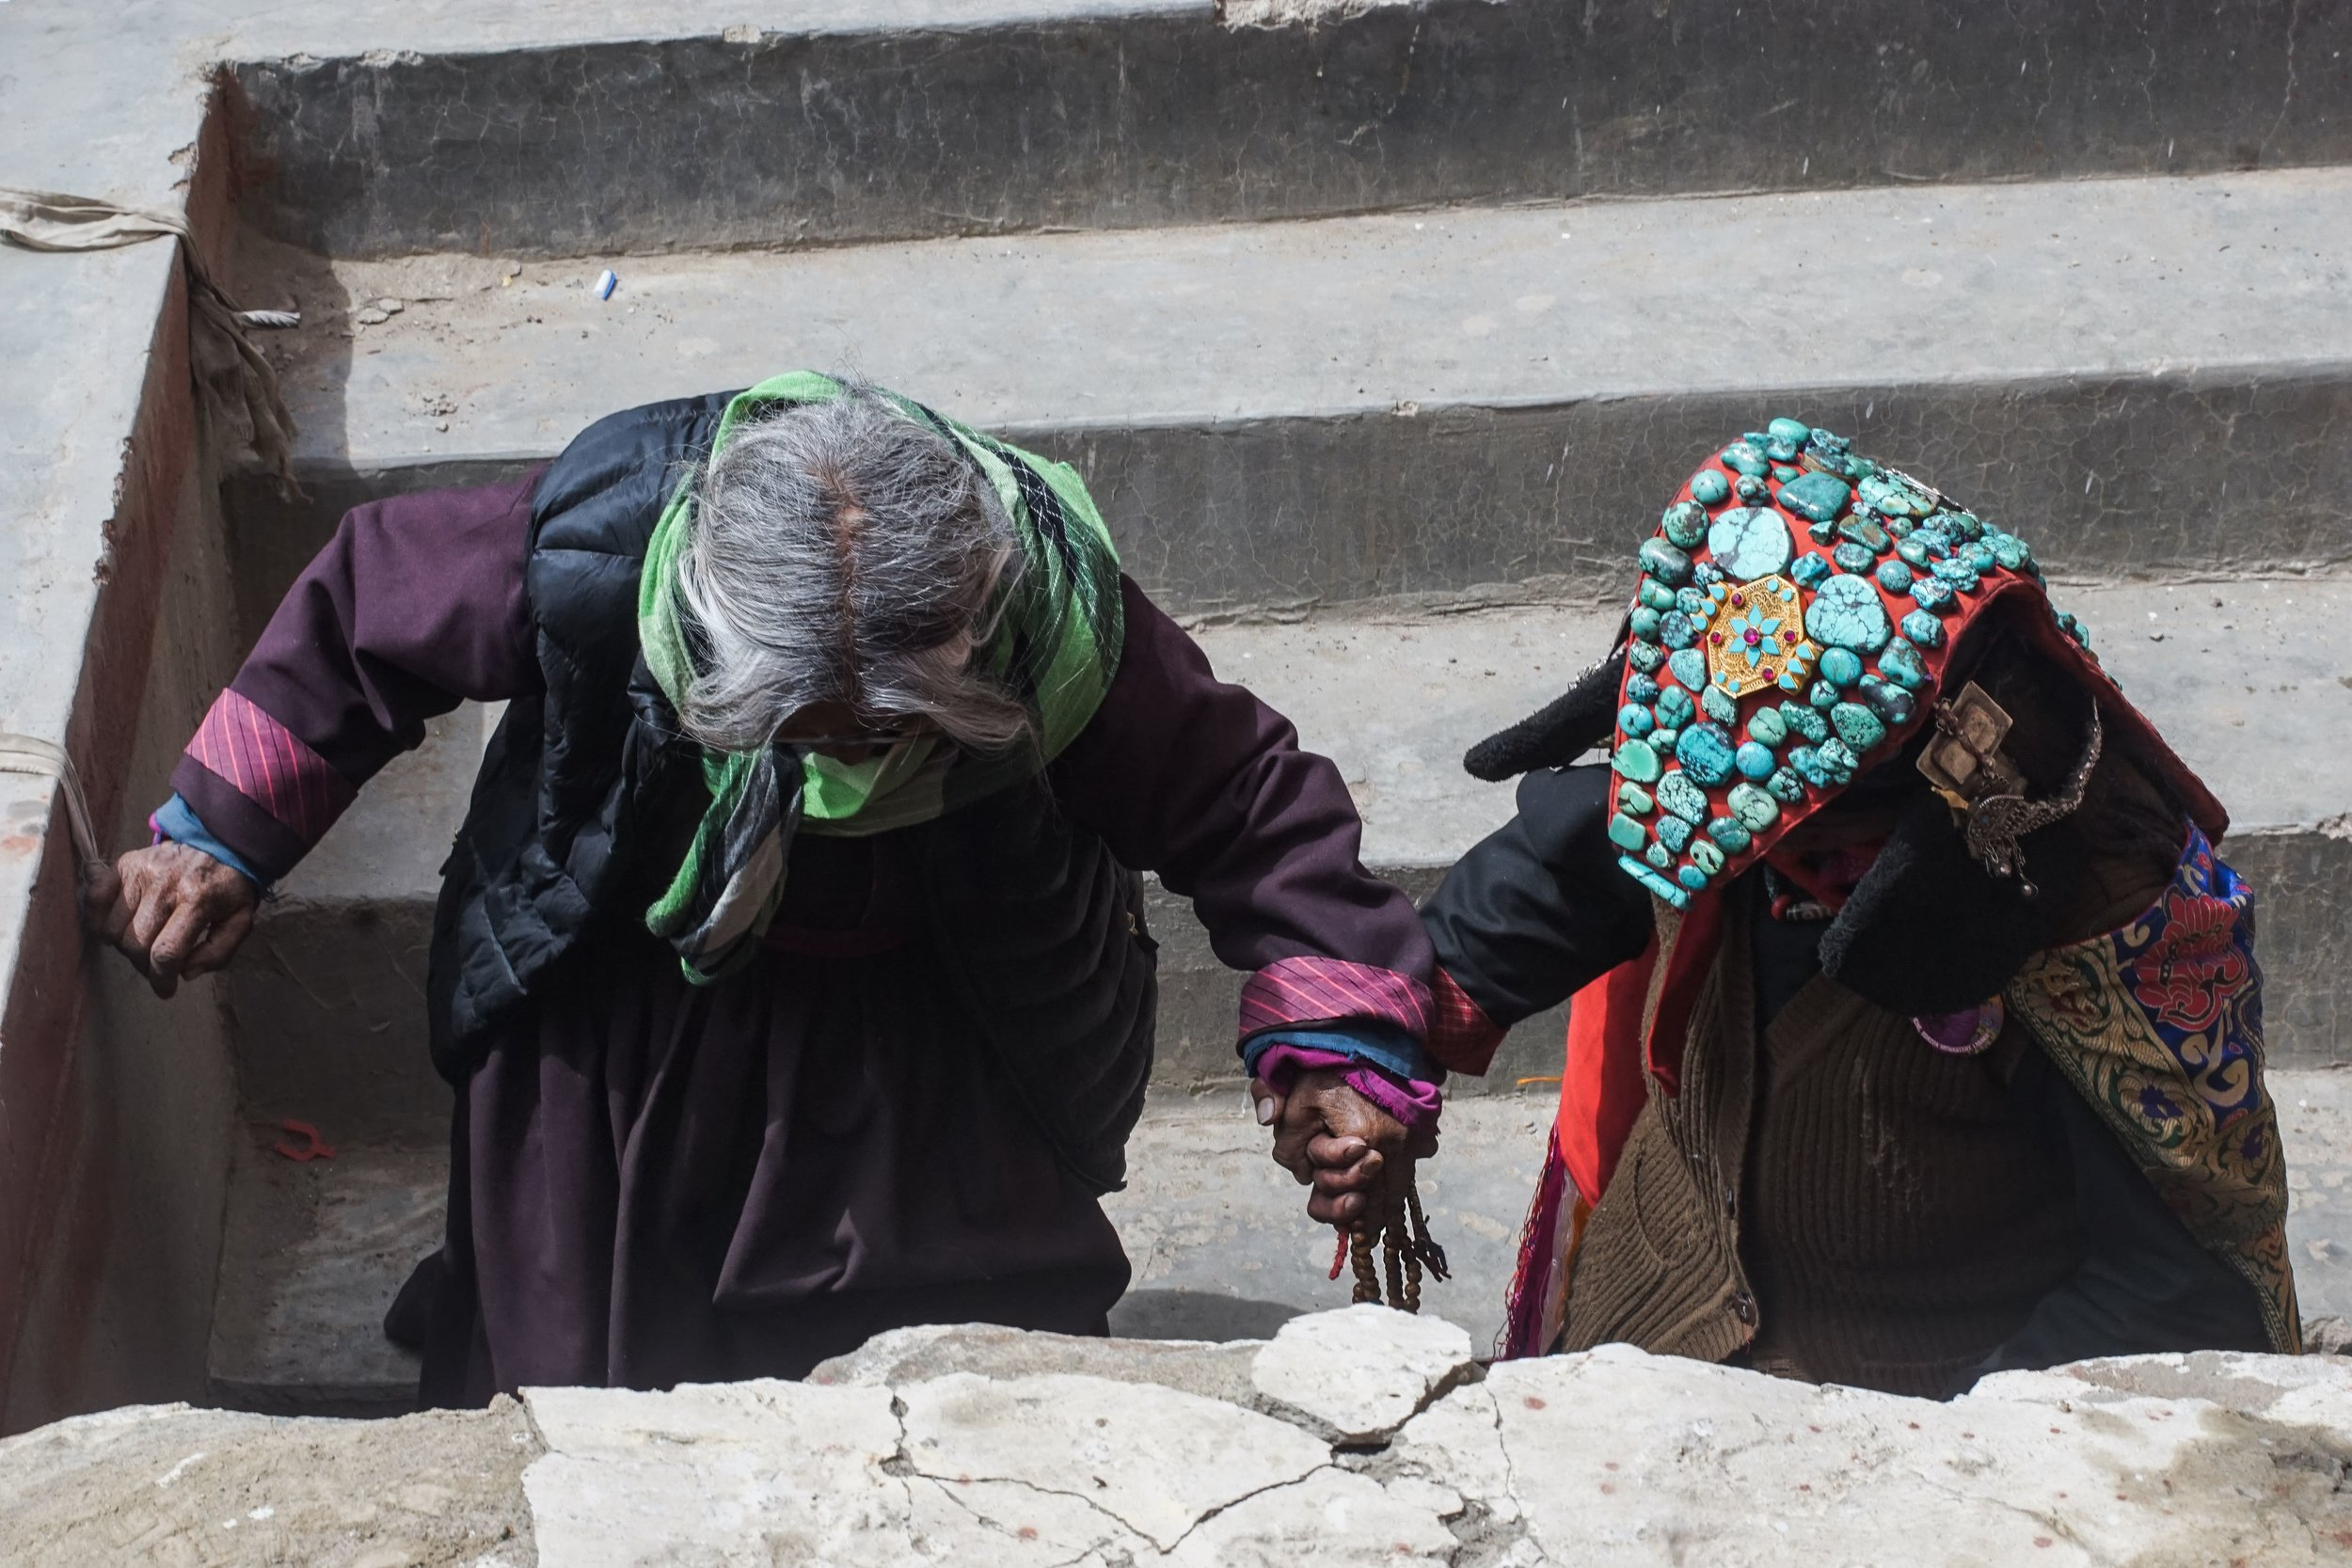 Changpa woman wearing traditional Ladakhi attire assists elder during local Buddhist festival.